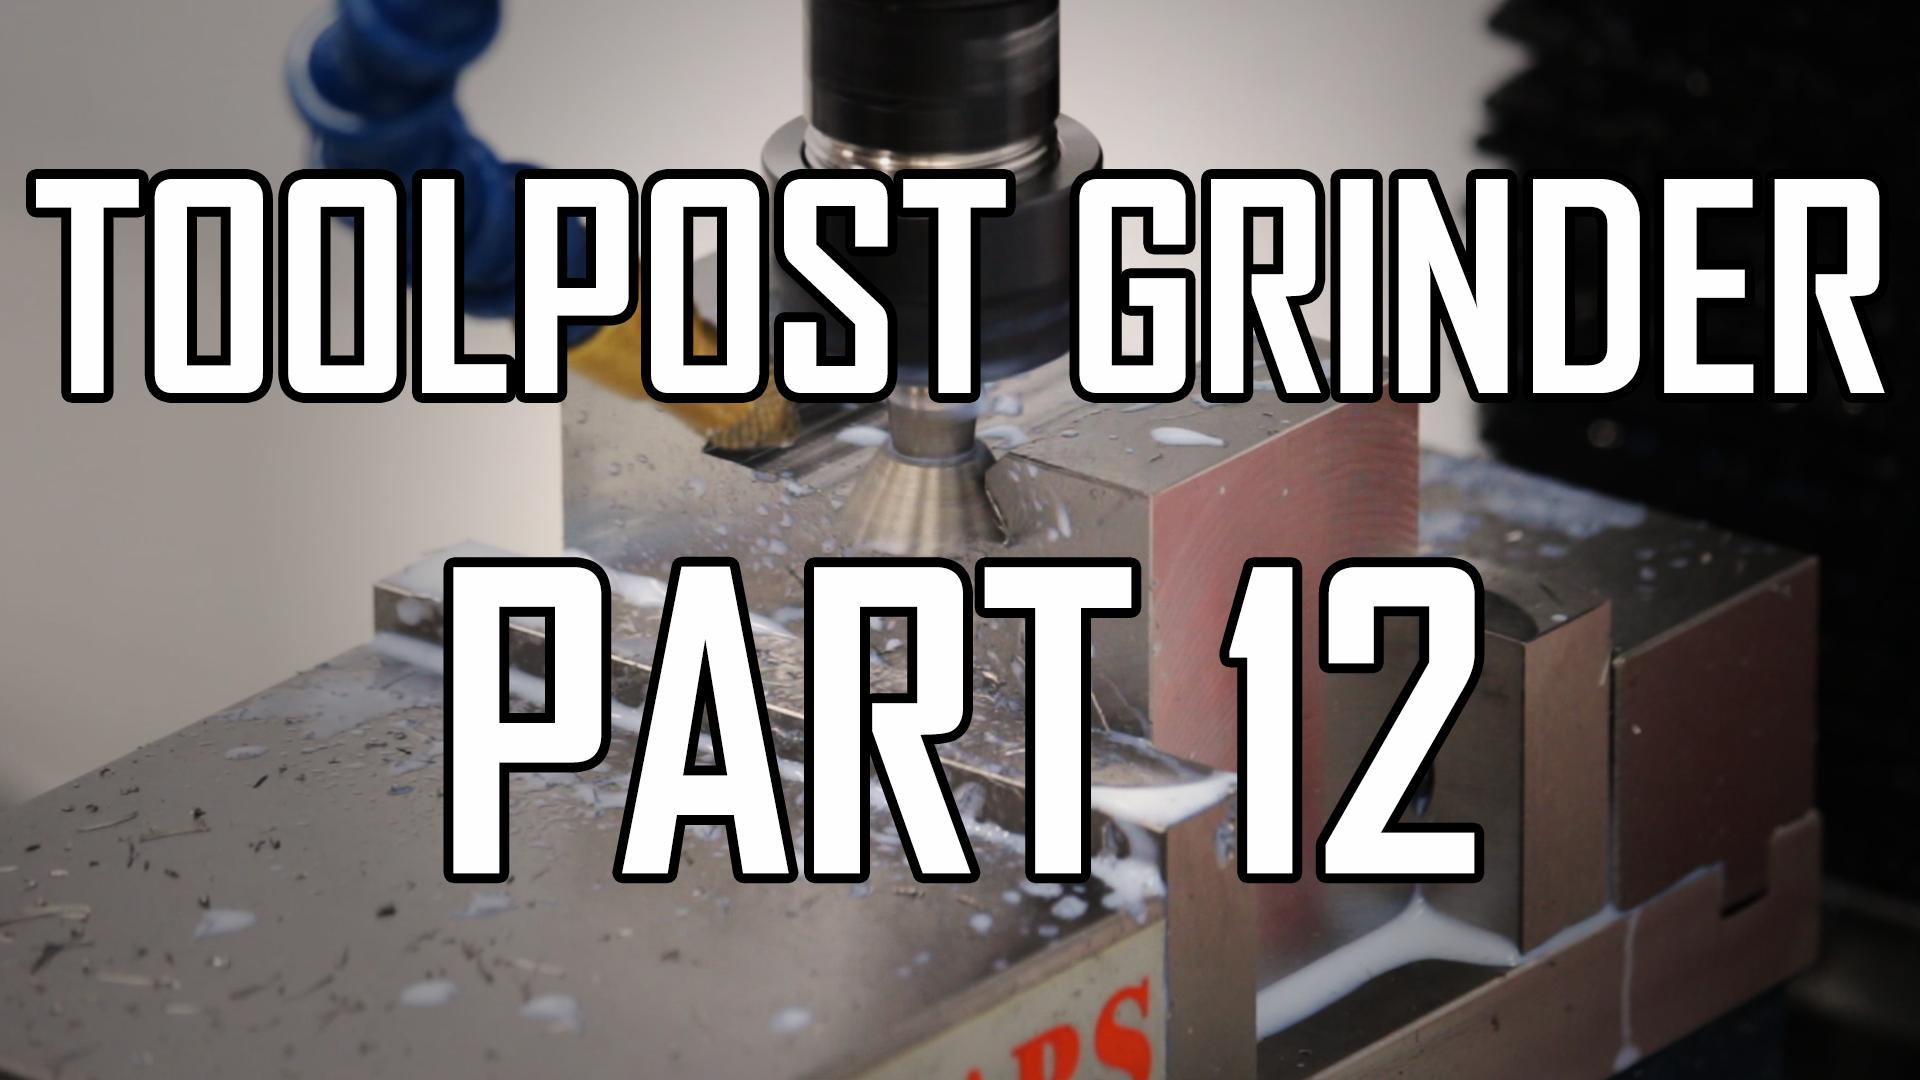 Toolpost Grinder Part 12: Toolpost Clamp 1